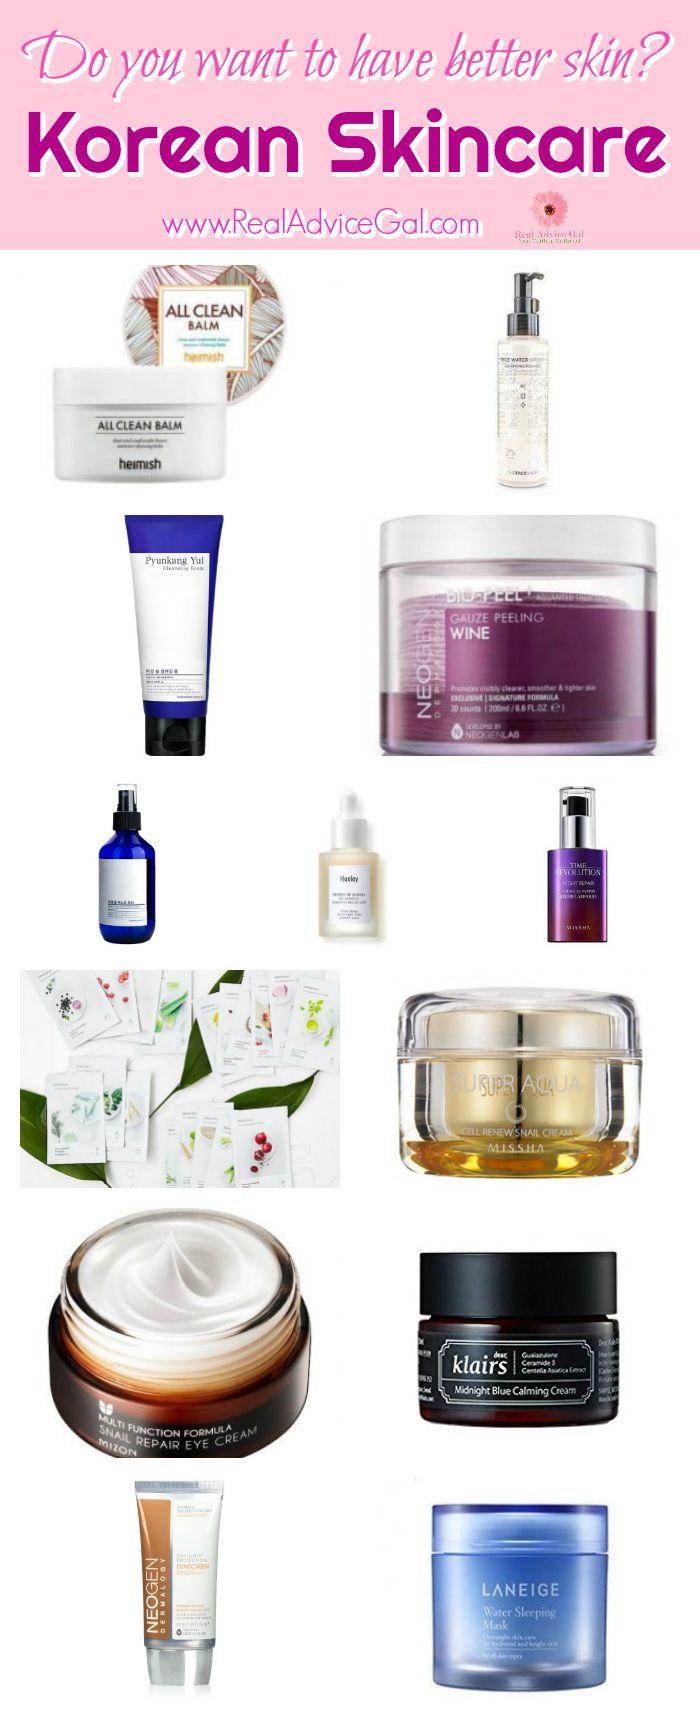 10 Step Korean Skin Care Routine Real Advice Gal Korean Skincare Routine Excellent Skin Care Korean Skincare